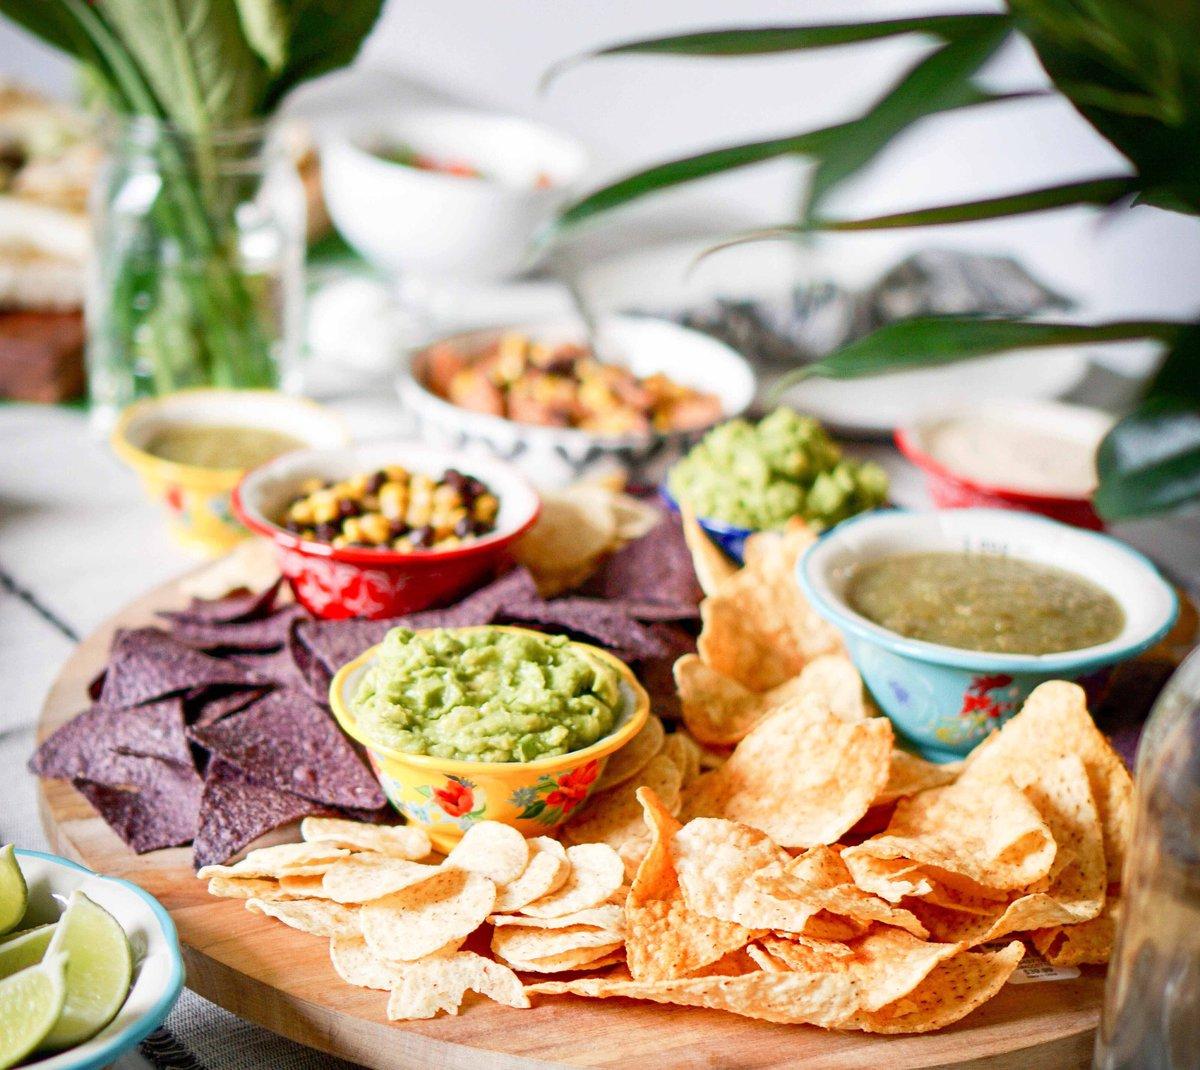 It´s National Spicy Guacamole Day in USA! #PicodeGallo and Avocado weren't enough for us! So now we enjoy a perfect spicy level Guacamole. #Perfect 🥑 🥑 🥑 #PetitGourmet #PetitgourmetSD #EverydayGourmet #Guacamole #SpicyGuacamole